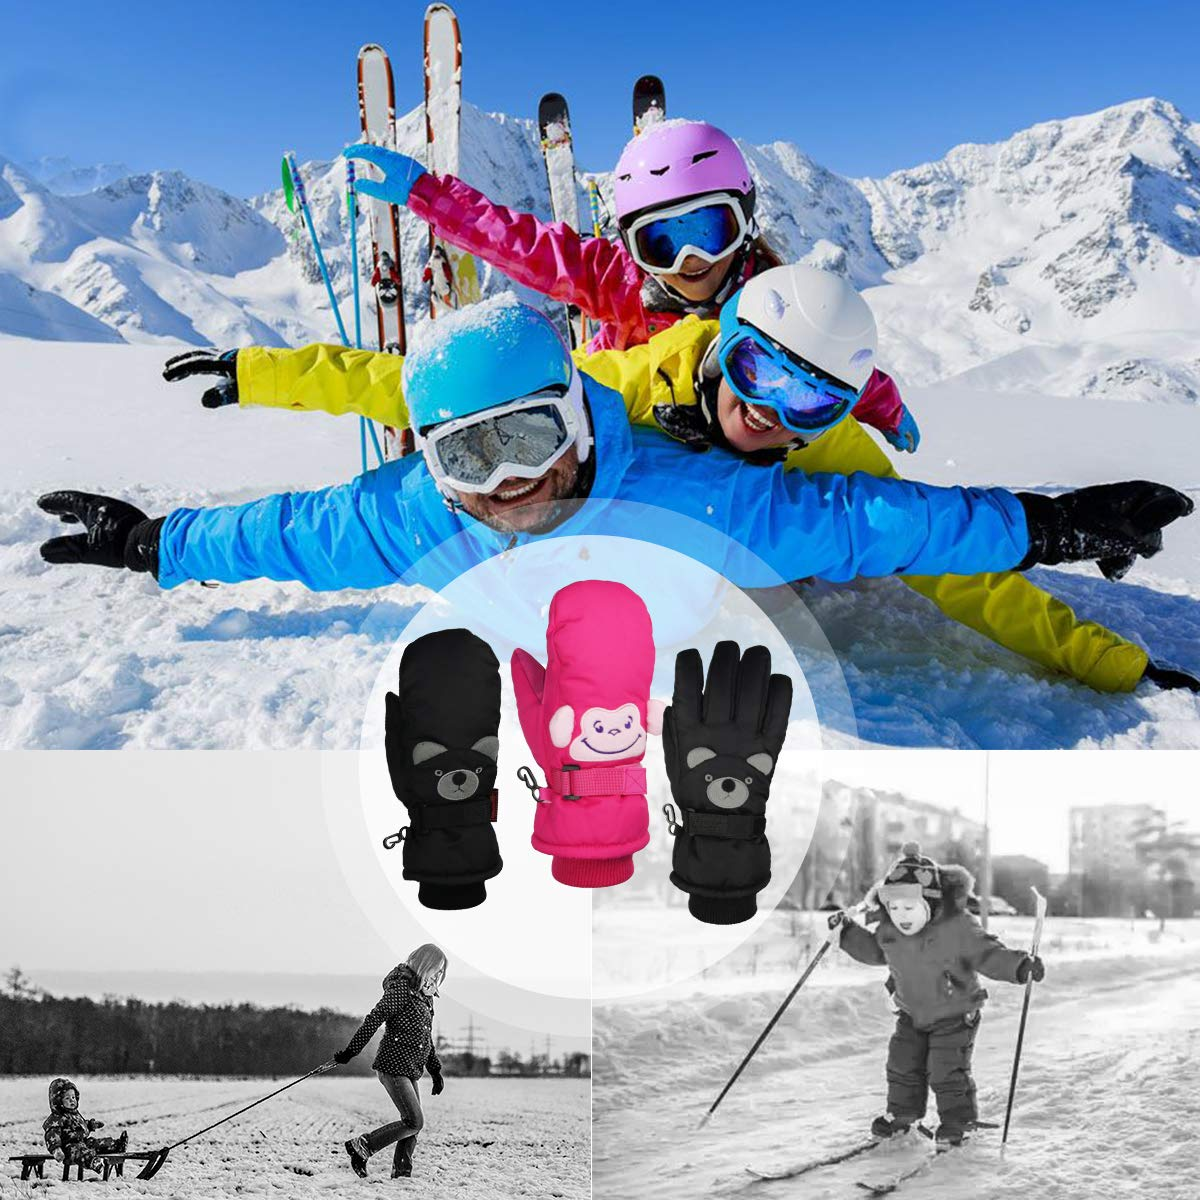 per Sport Invernali e Neve per Snowboard Momoon per Bambini Guanti da Sci per Bambini